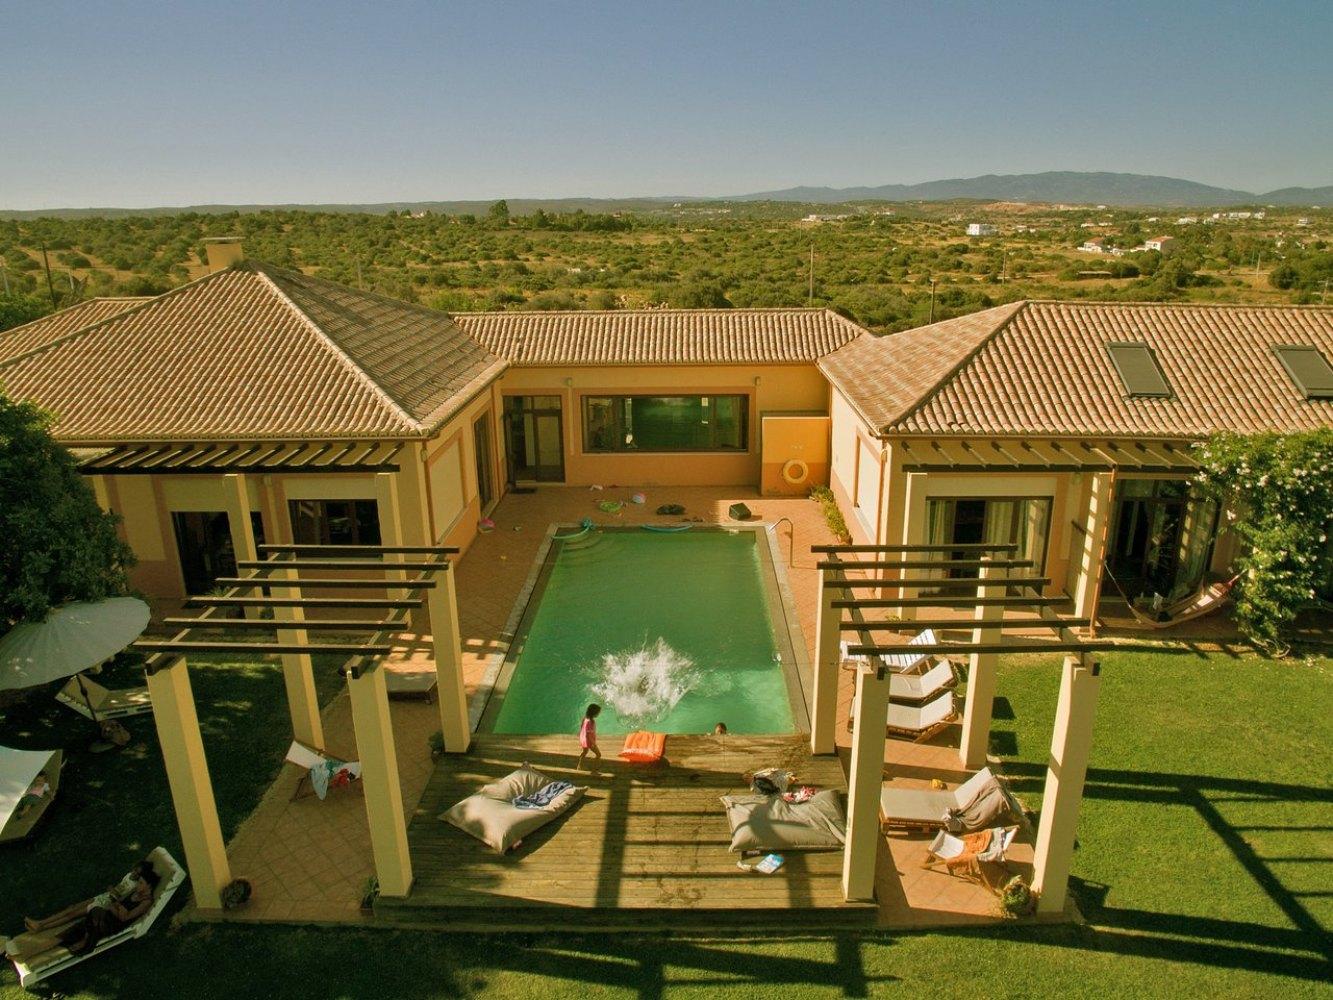 Casa Vale da Lama Eco-resort